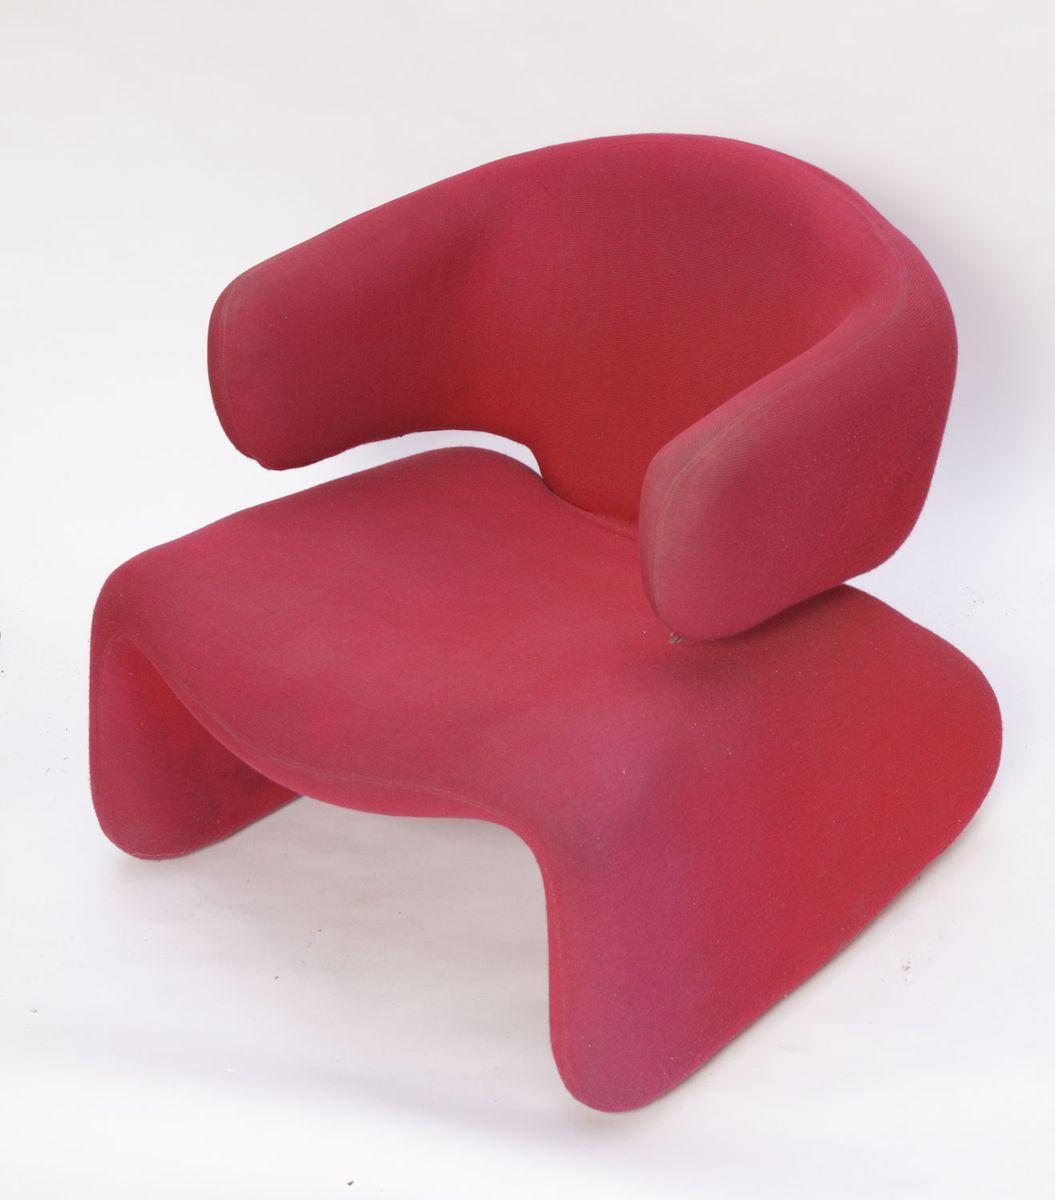 rote djinn sessel von olivier mourgue f r airborne 1965 2er set bei pamono kaufen. Black Bedroom Furniture Sets. Home Design Ideas